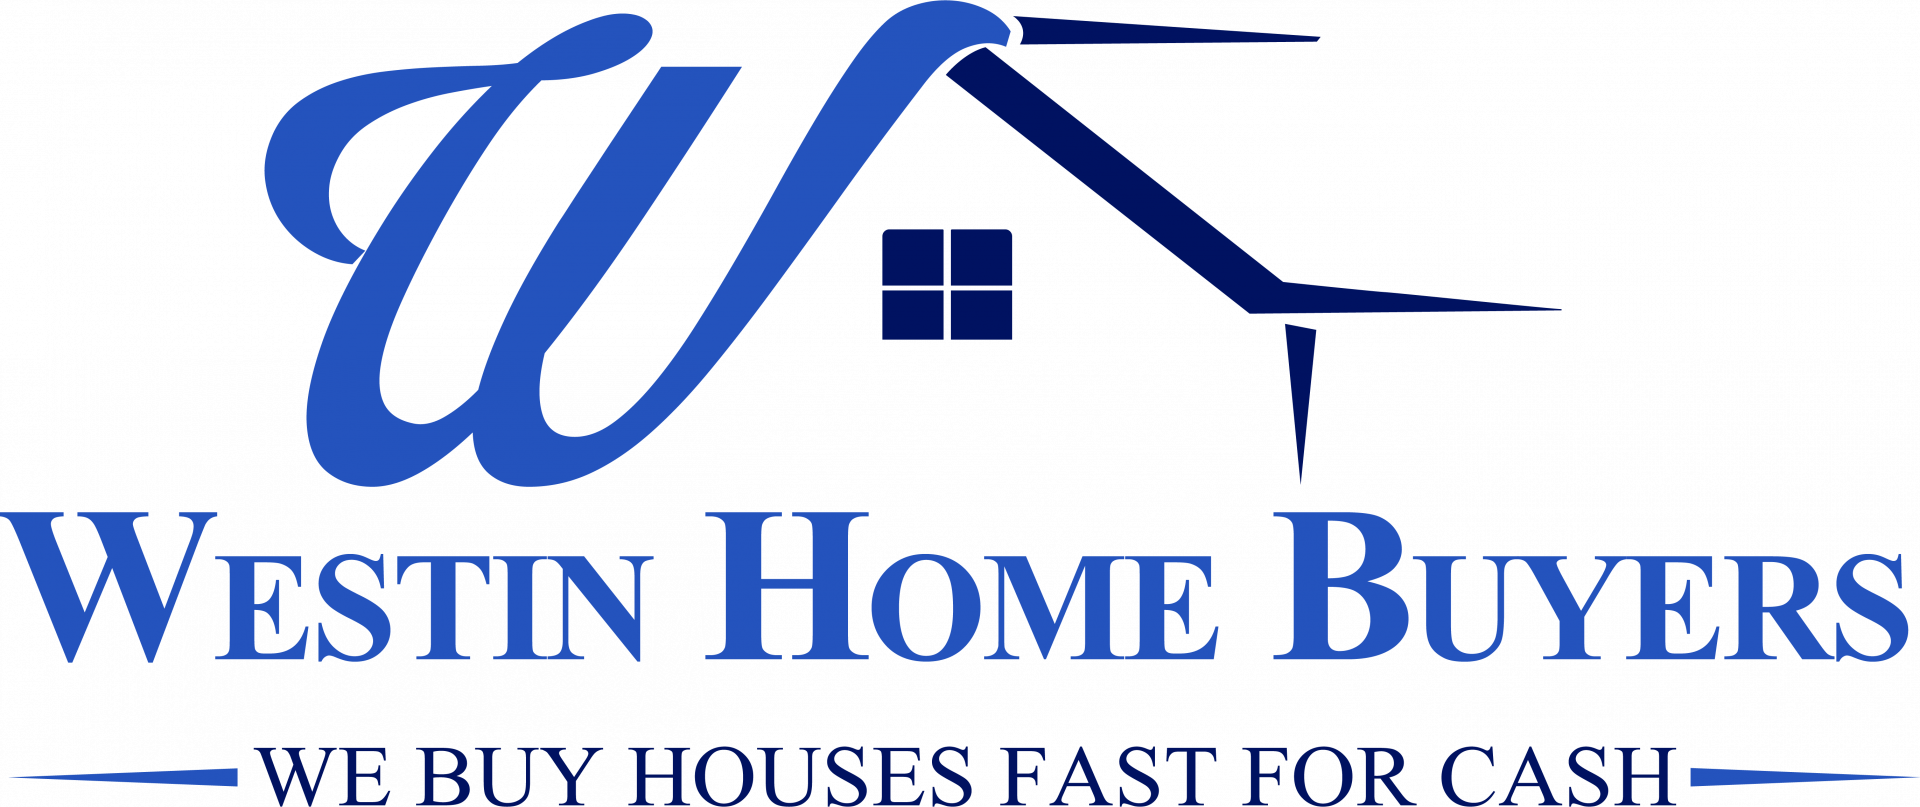 Westin Home Buyers  logo